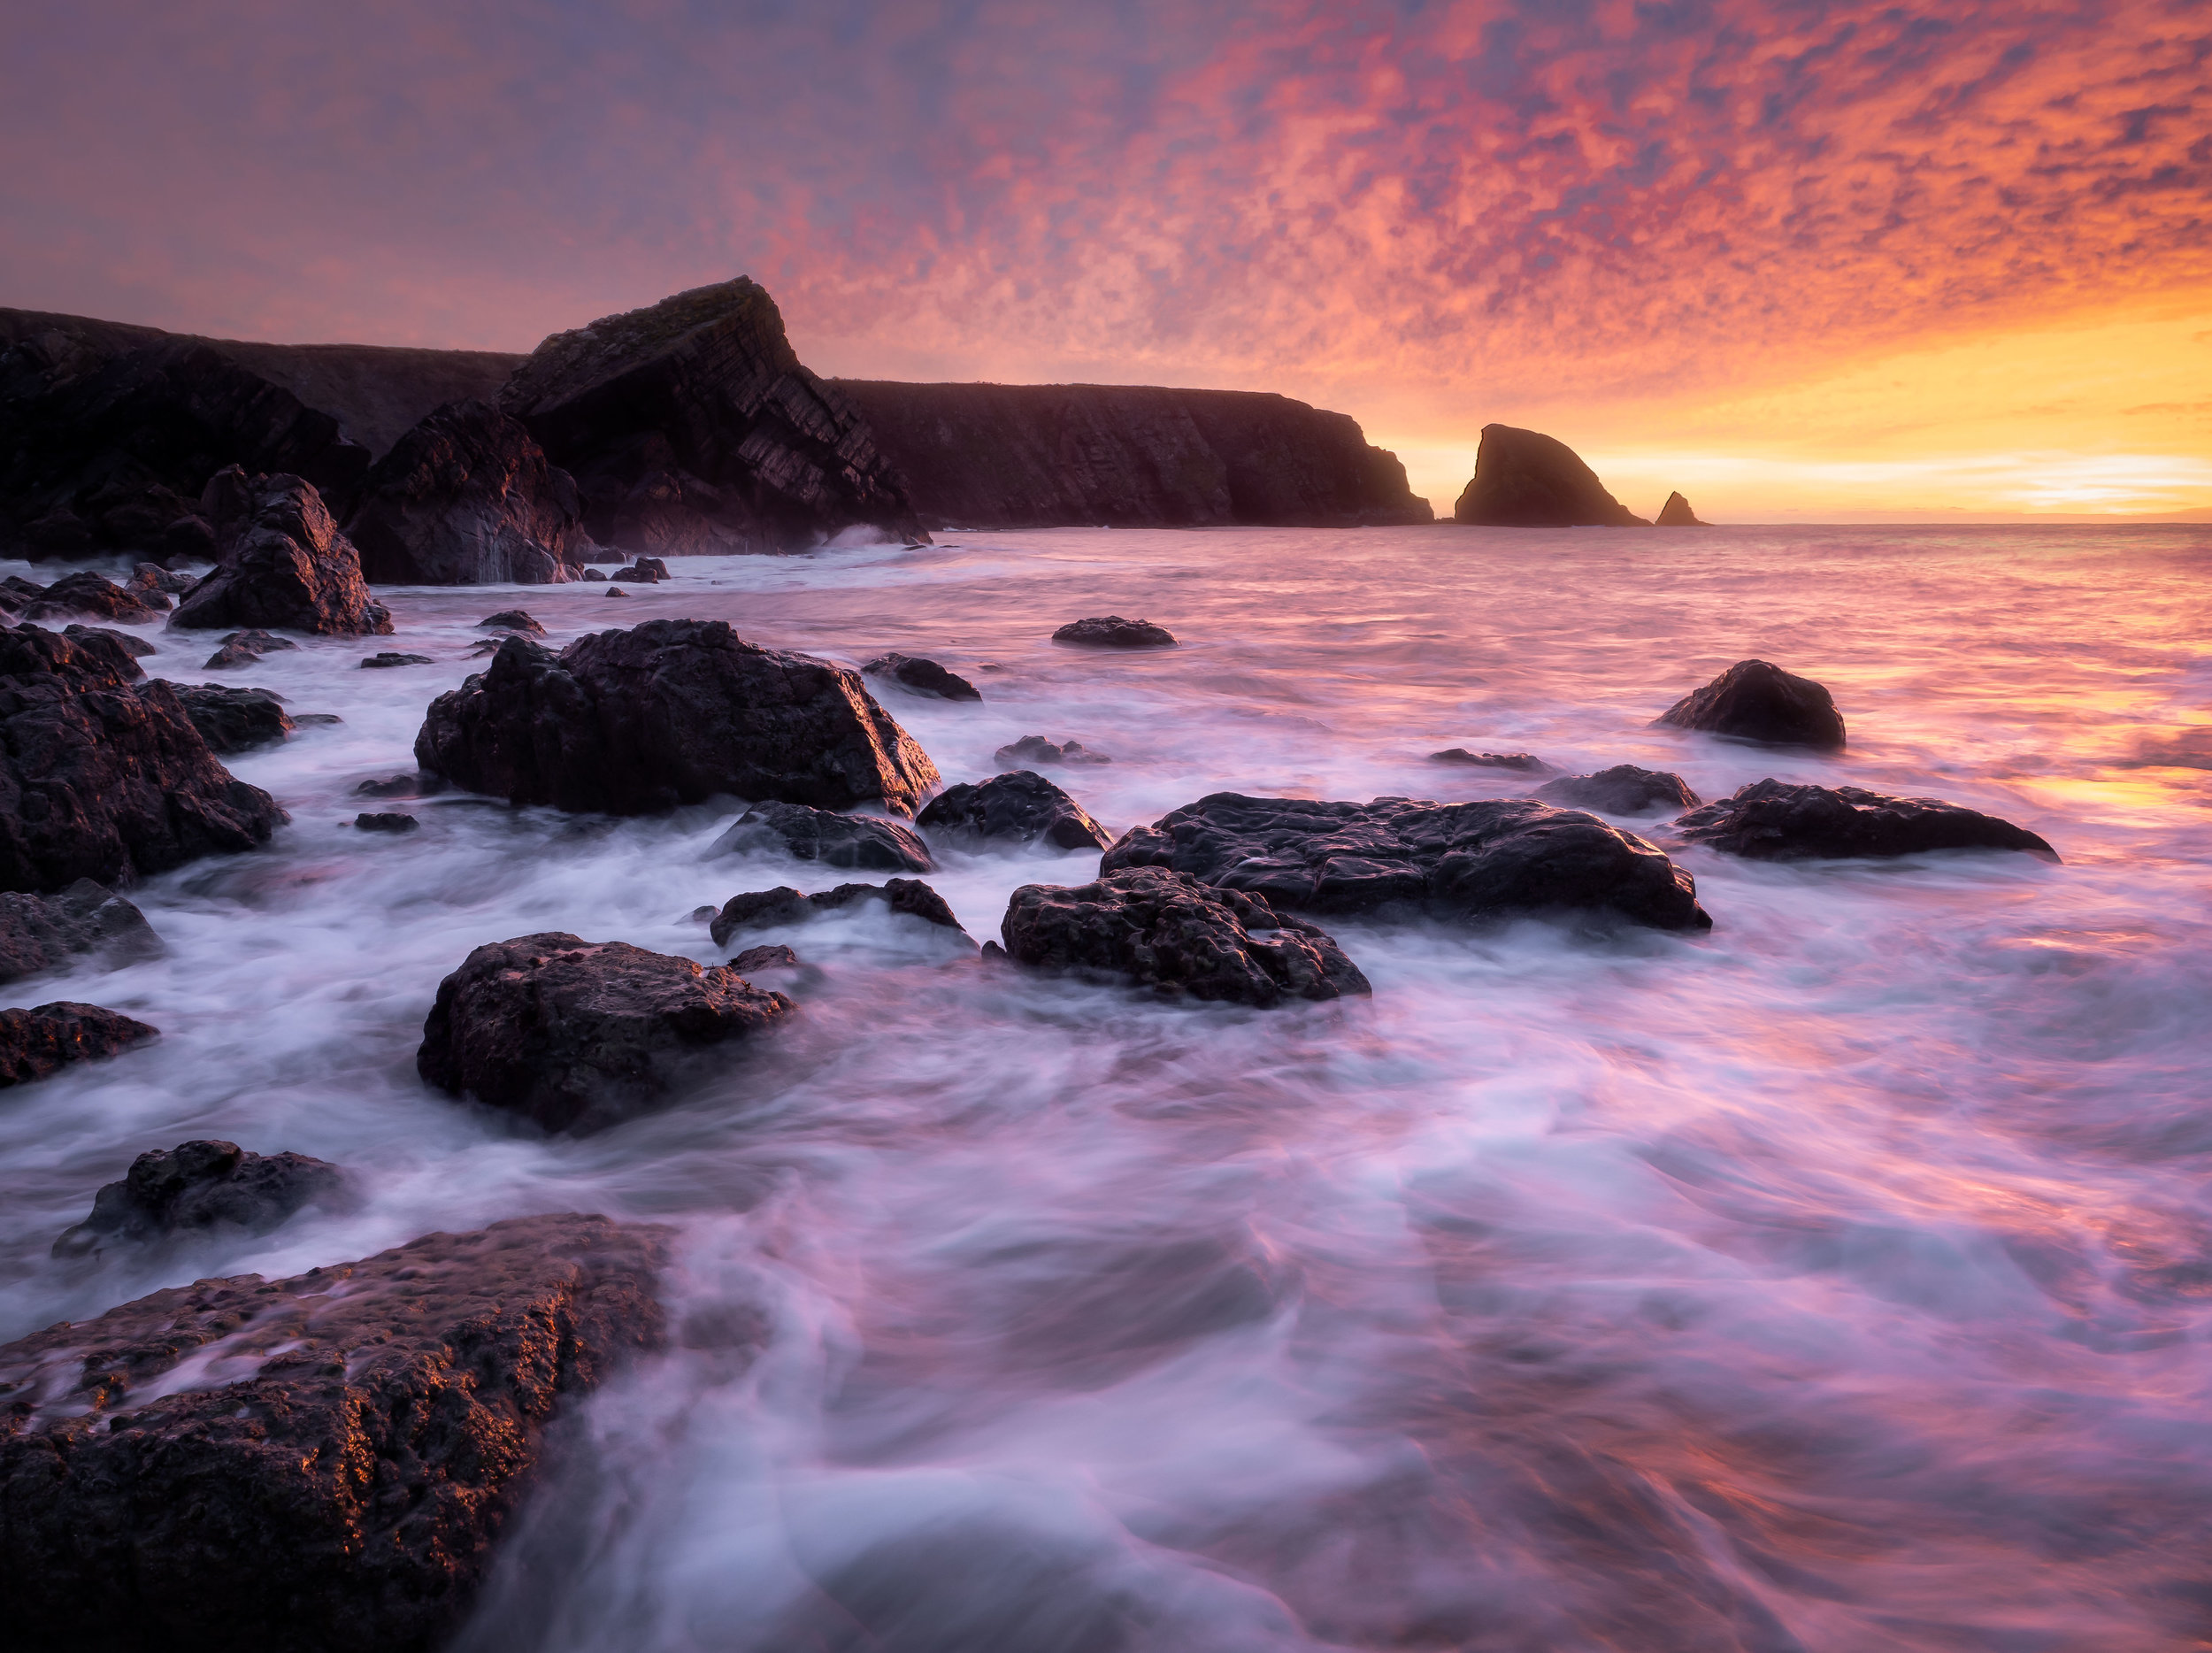 A spectacular sunrise captured on the east coast